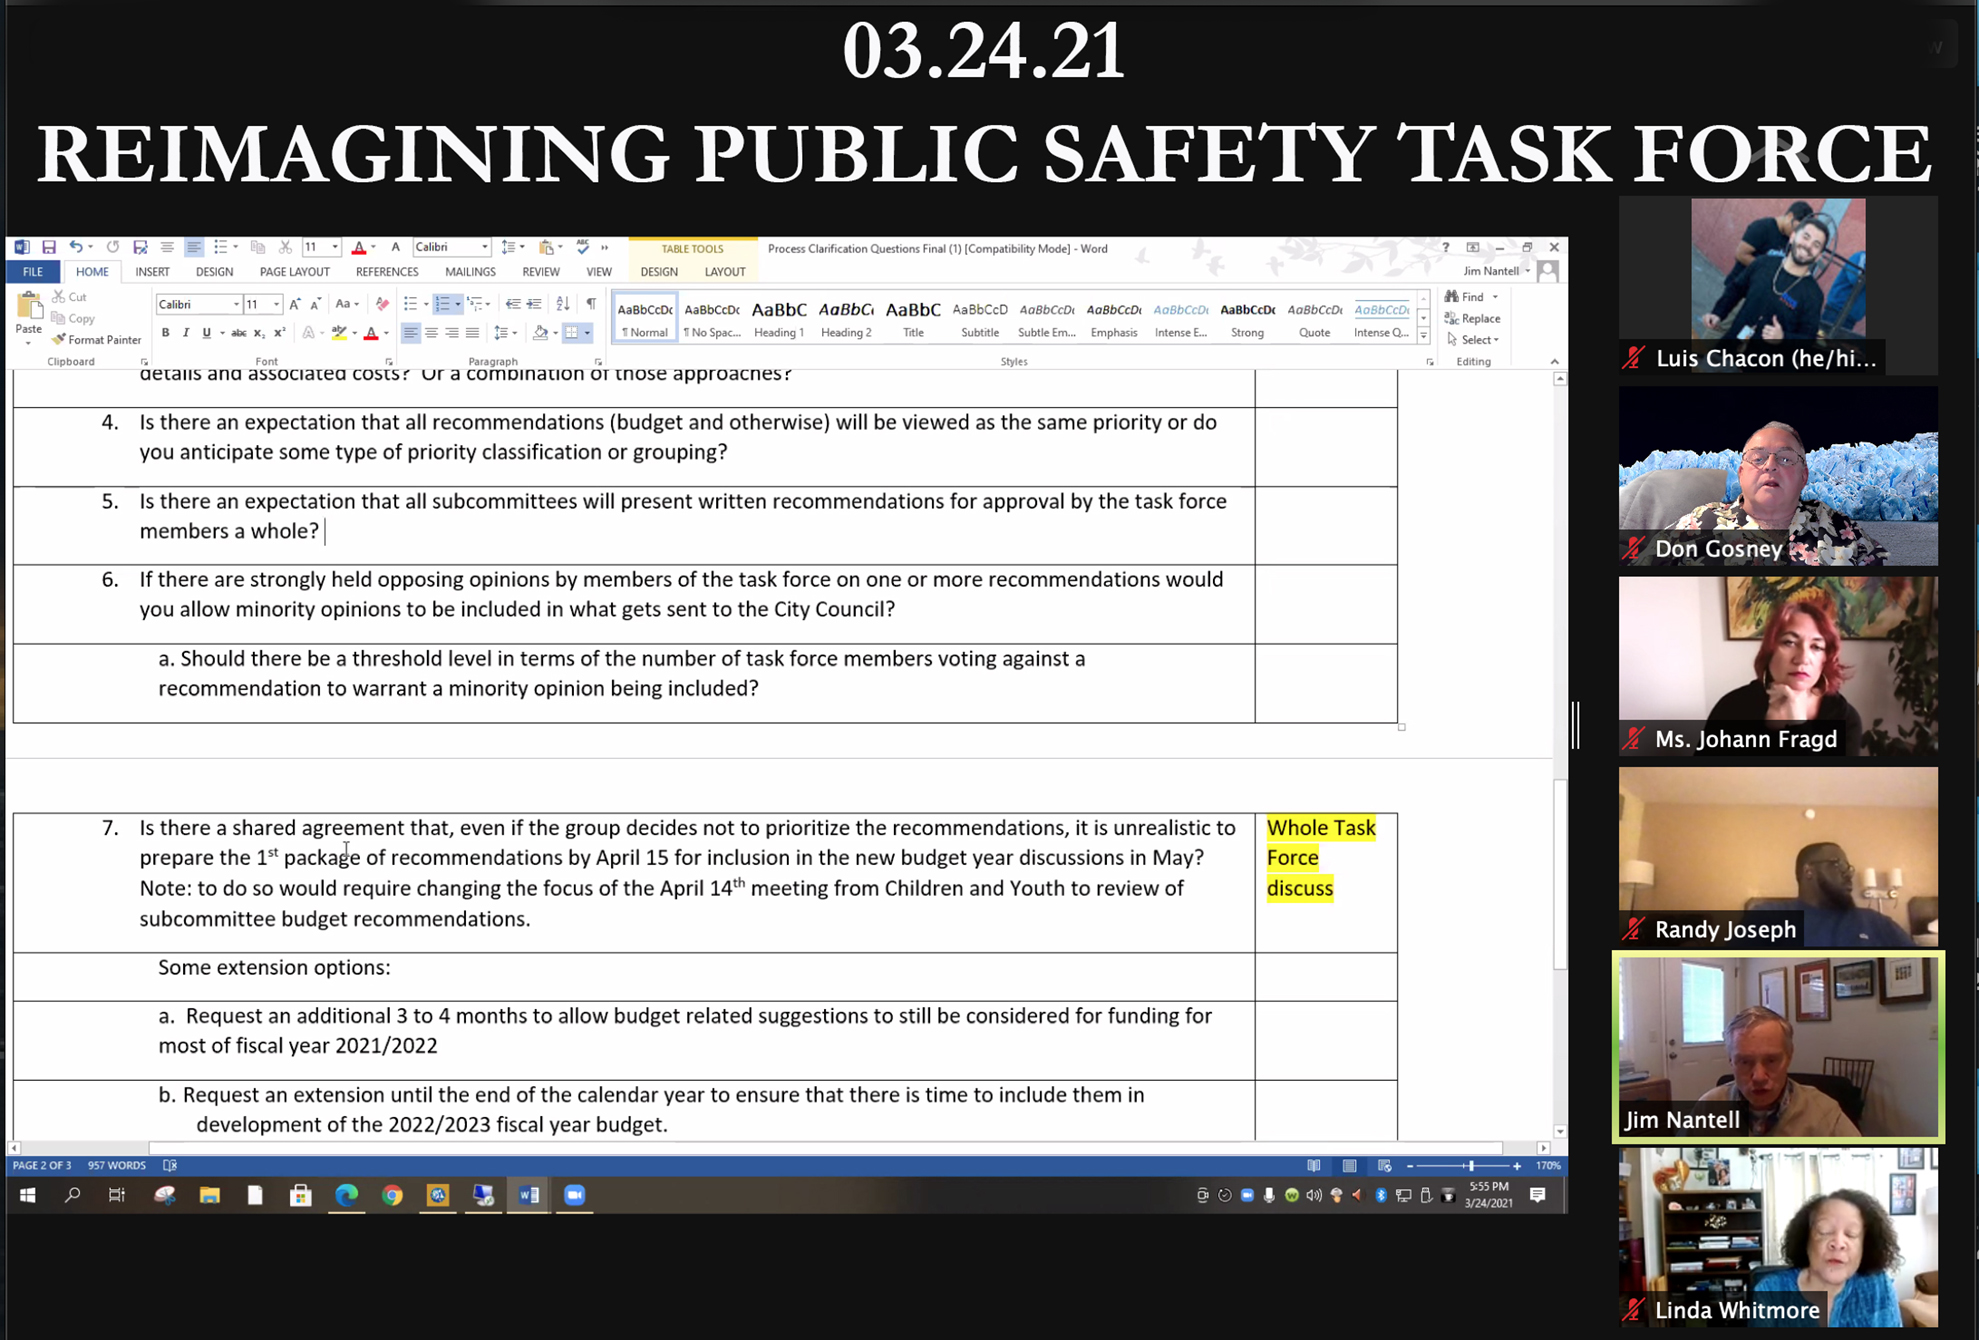 03.24.21_Reimagining_Public_Safety_Task_Force_Meeting___RFR.jpg